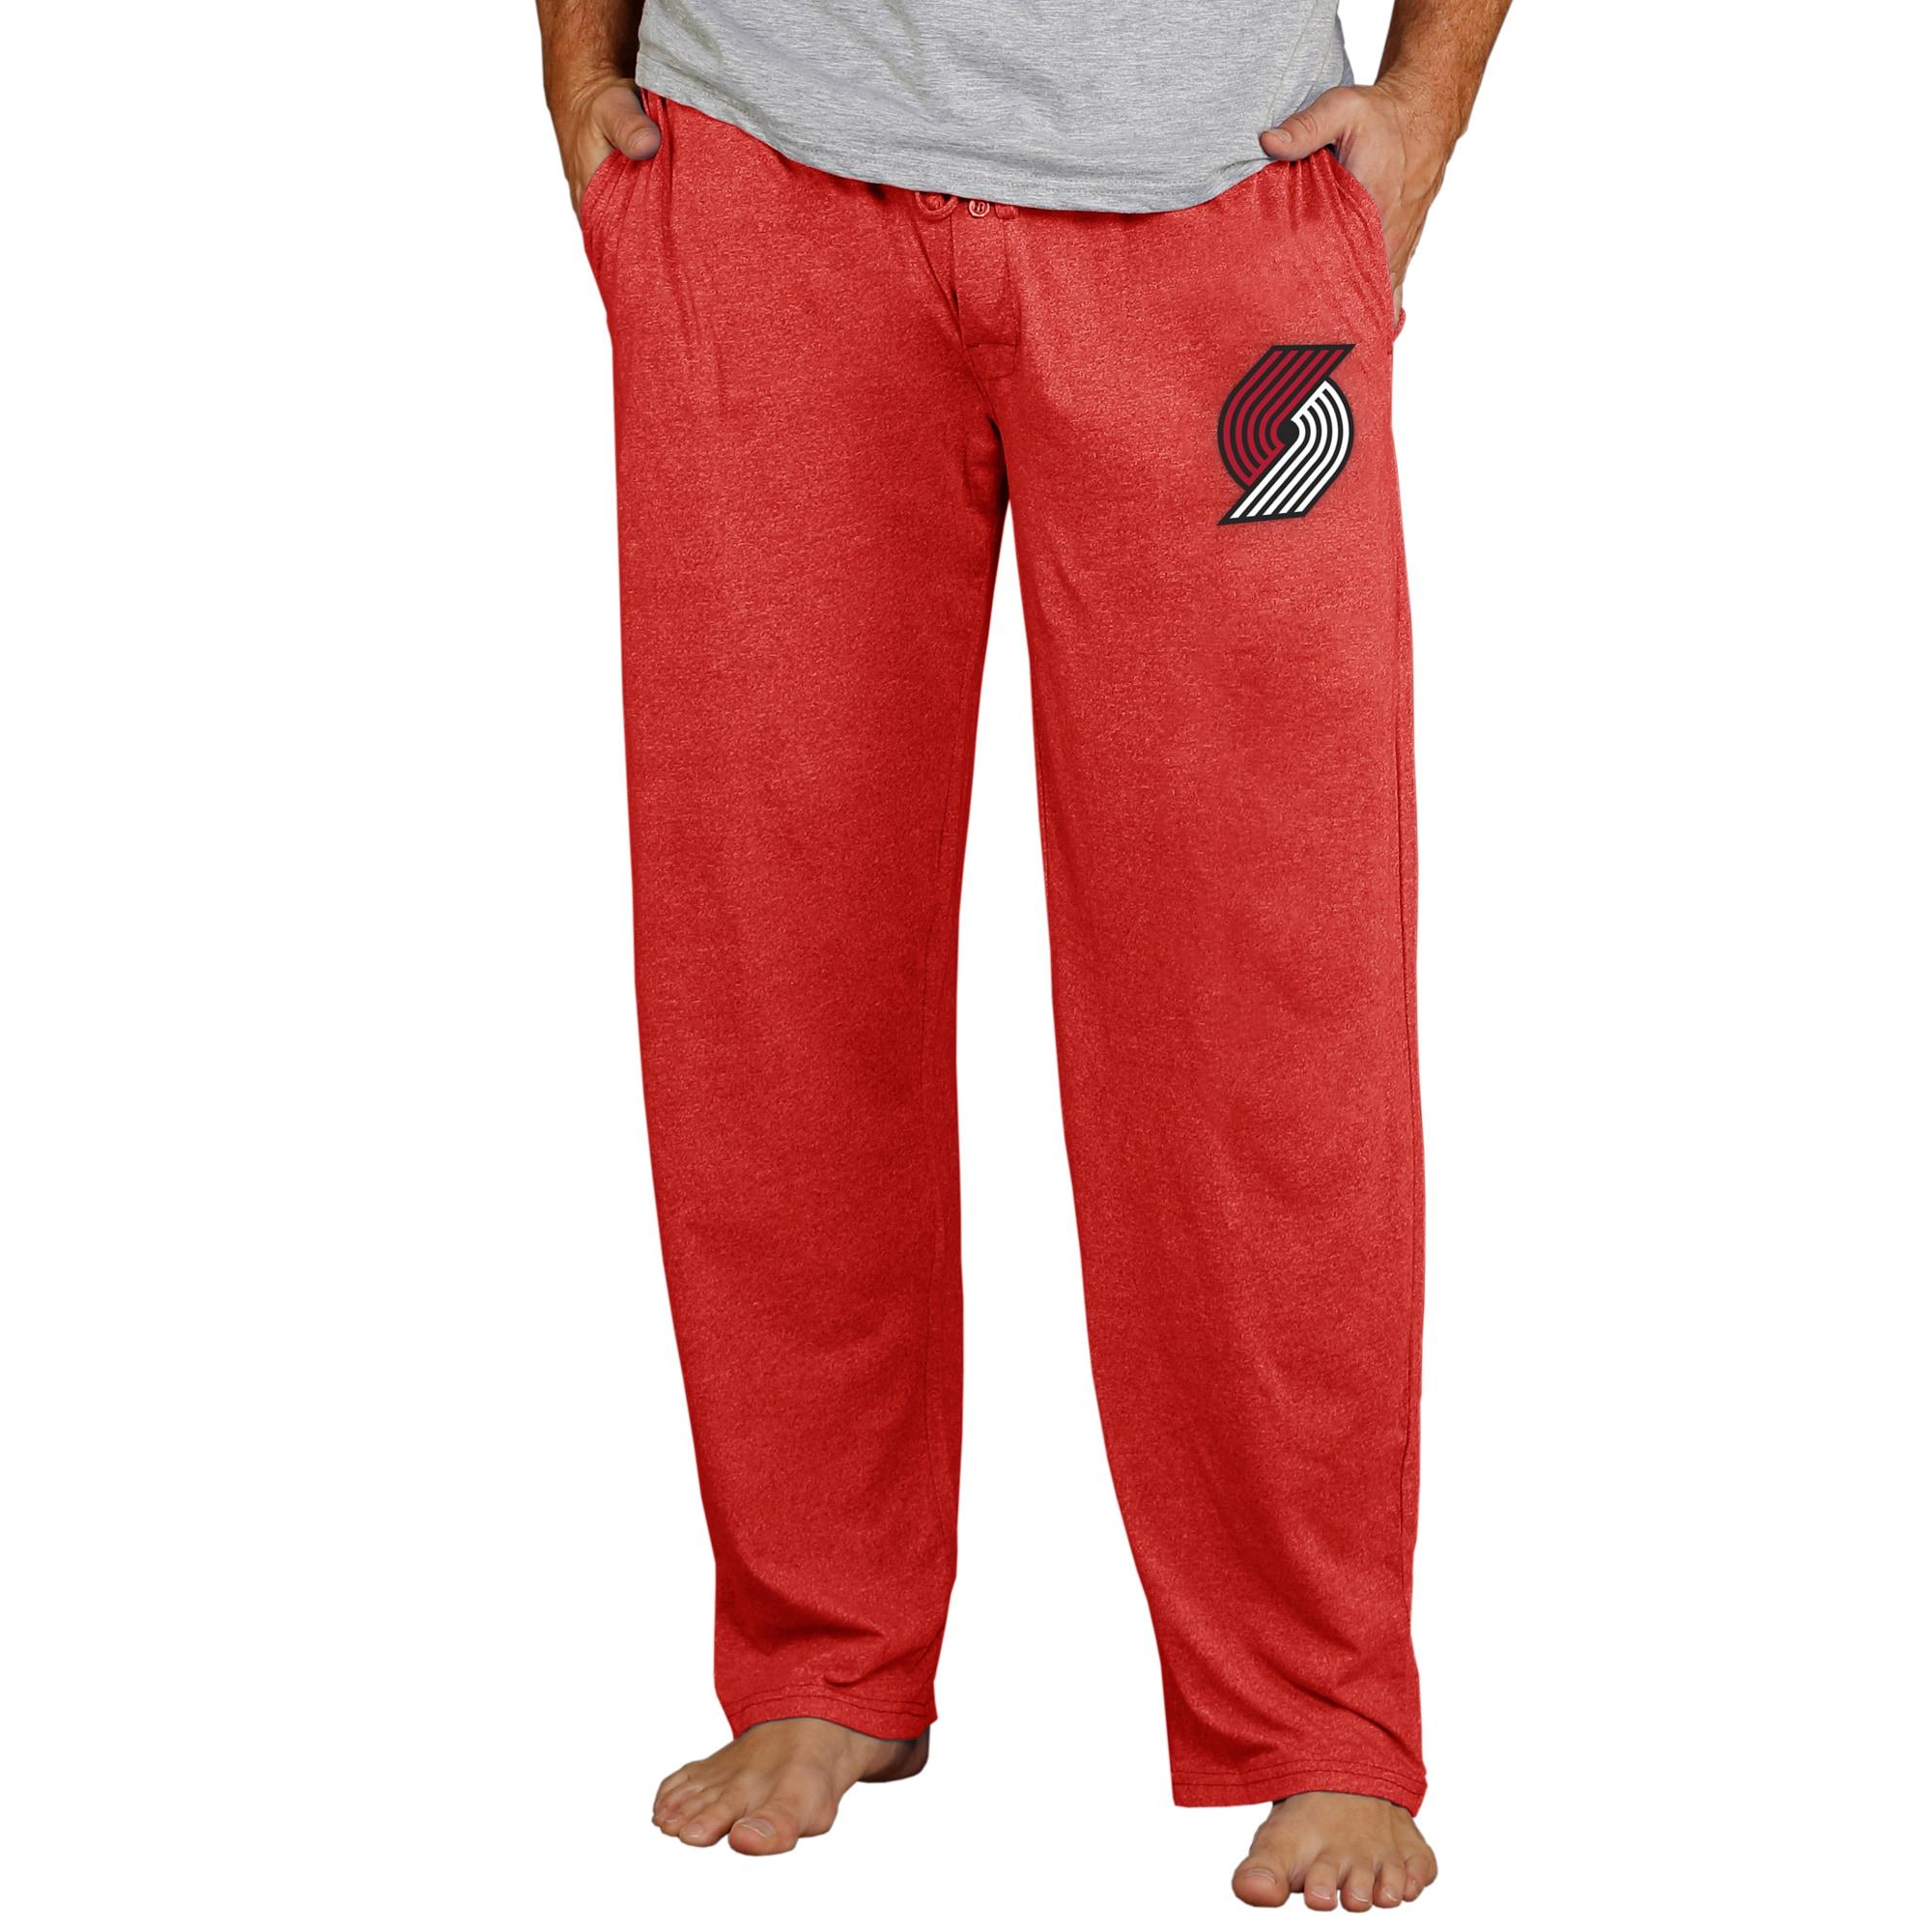 Portland Trail Blazers Concepts Sport Quest Knit Pants - Red